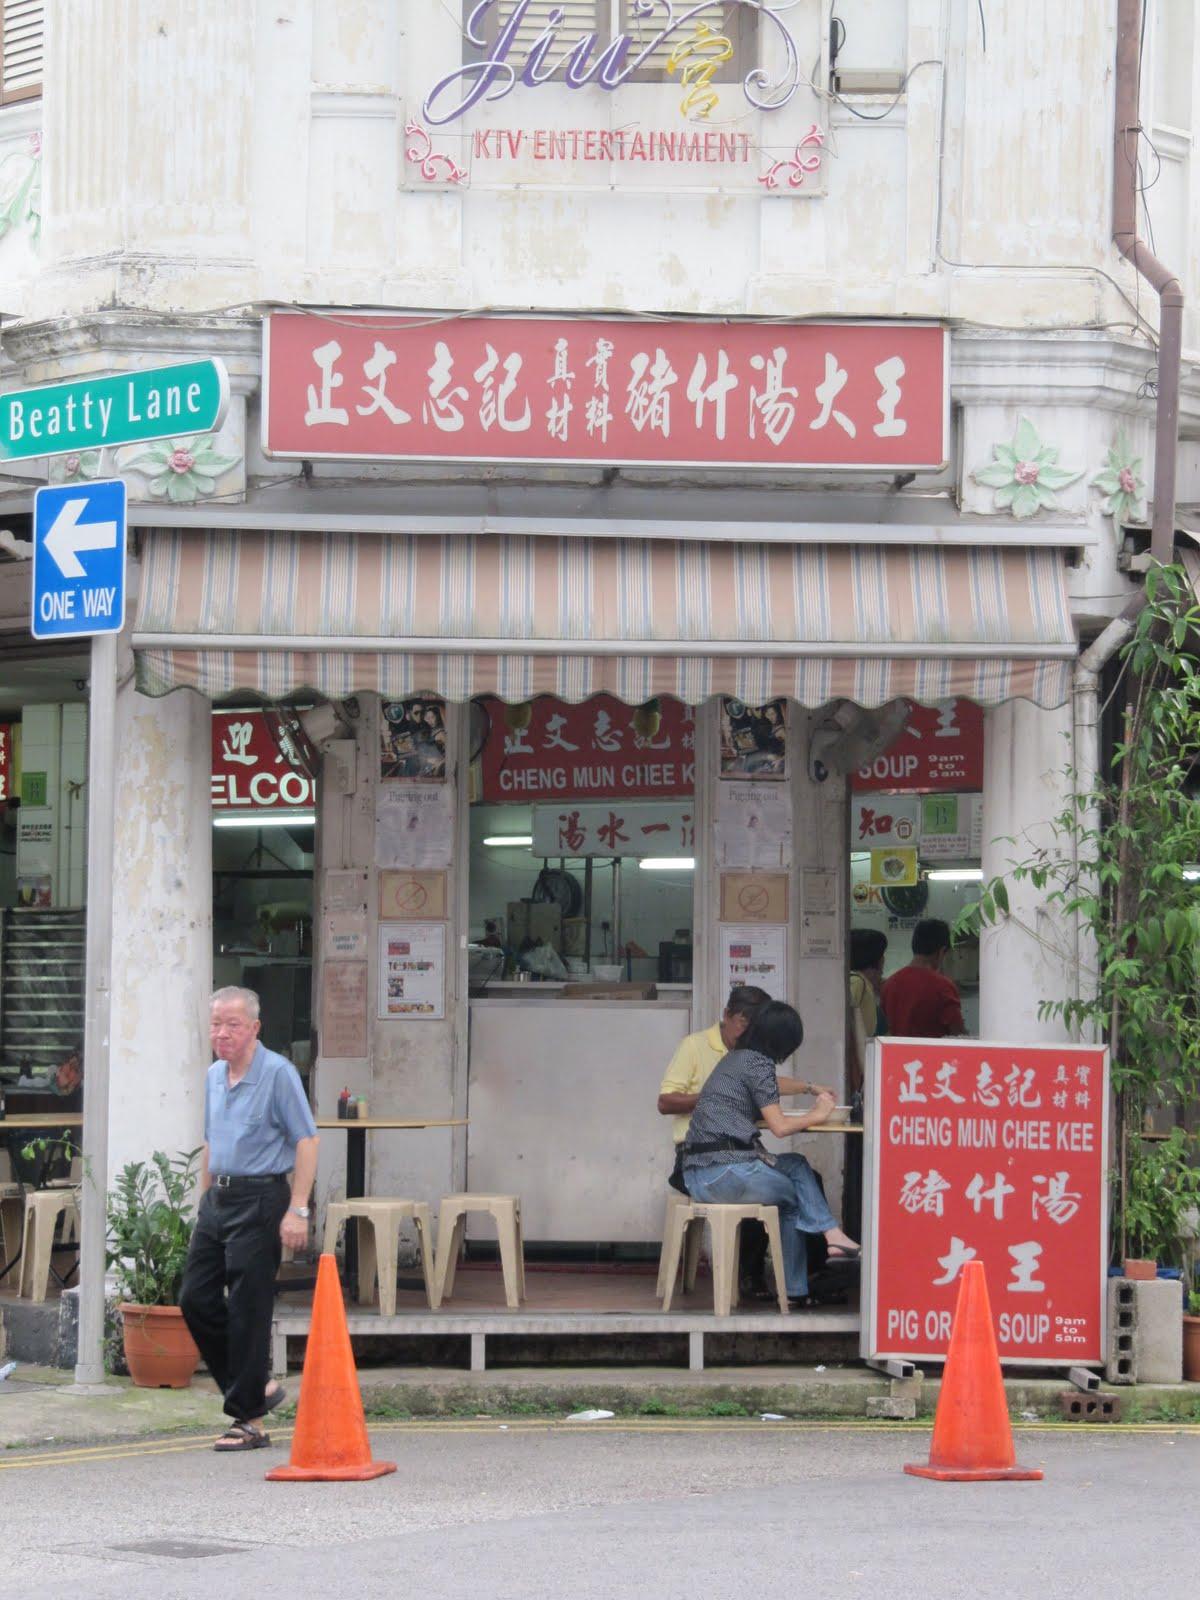 Wen S Delight Cheng Mun Chee Kee Pig Organ Soup